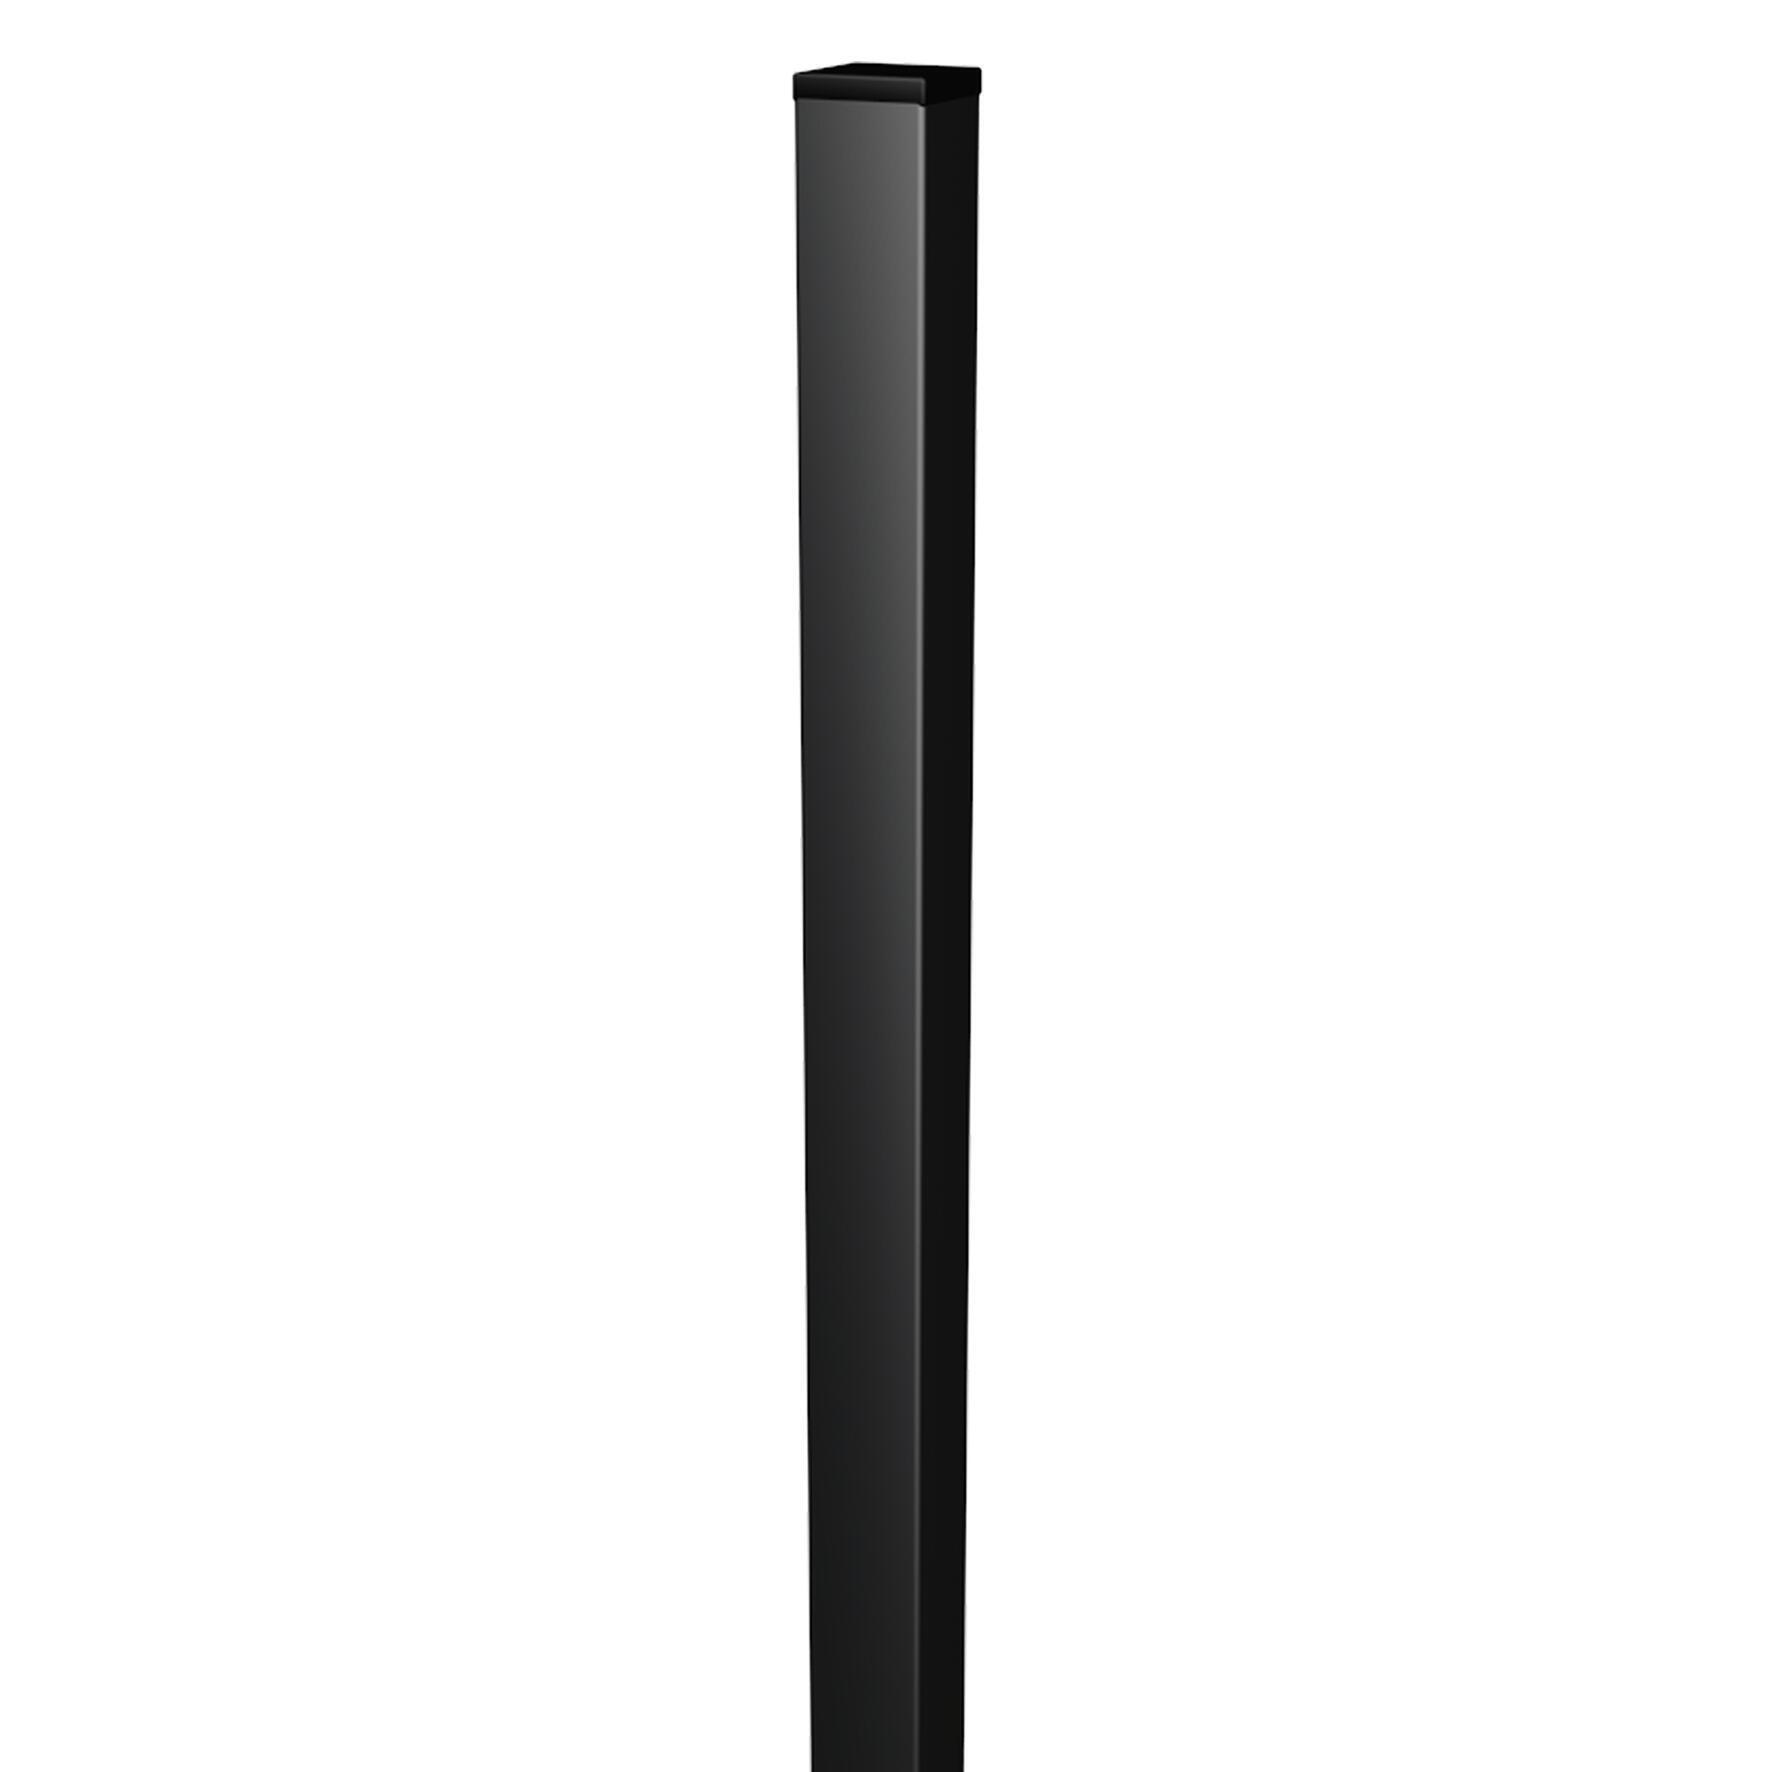 Palo in acciaio galvanizzato plastificato Medium quadrato H 130 cm L 5 x 5 cm